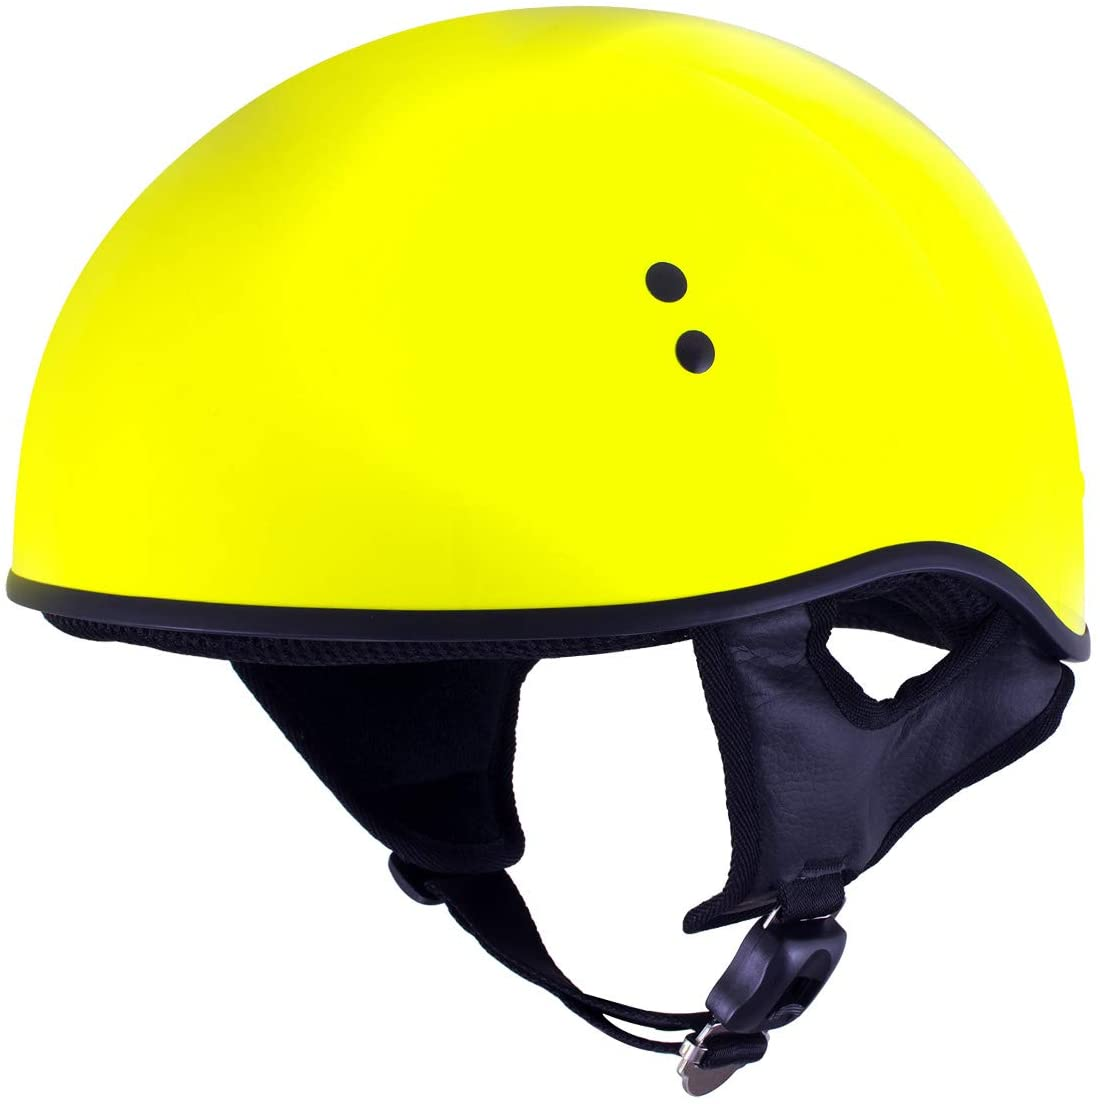 Outlaw T68 'The O.G.' Hi-Vis Yellow Advanced Motorcycle Skull Cap Half DOT Helmet - X-Large